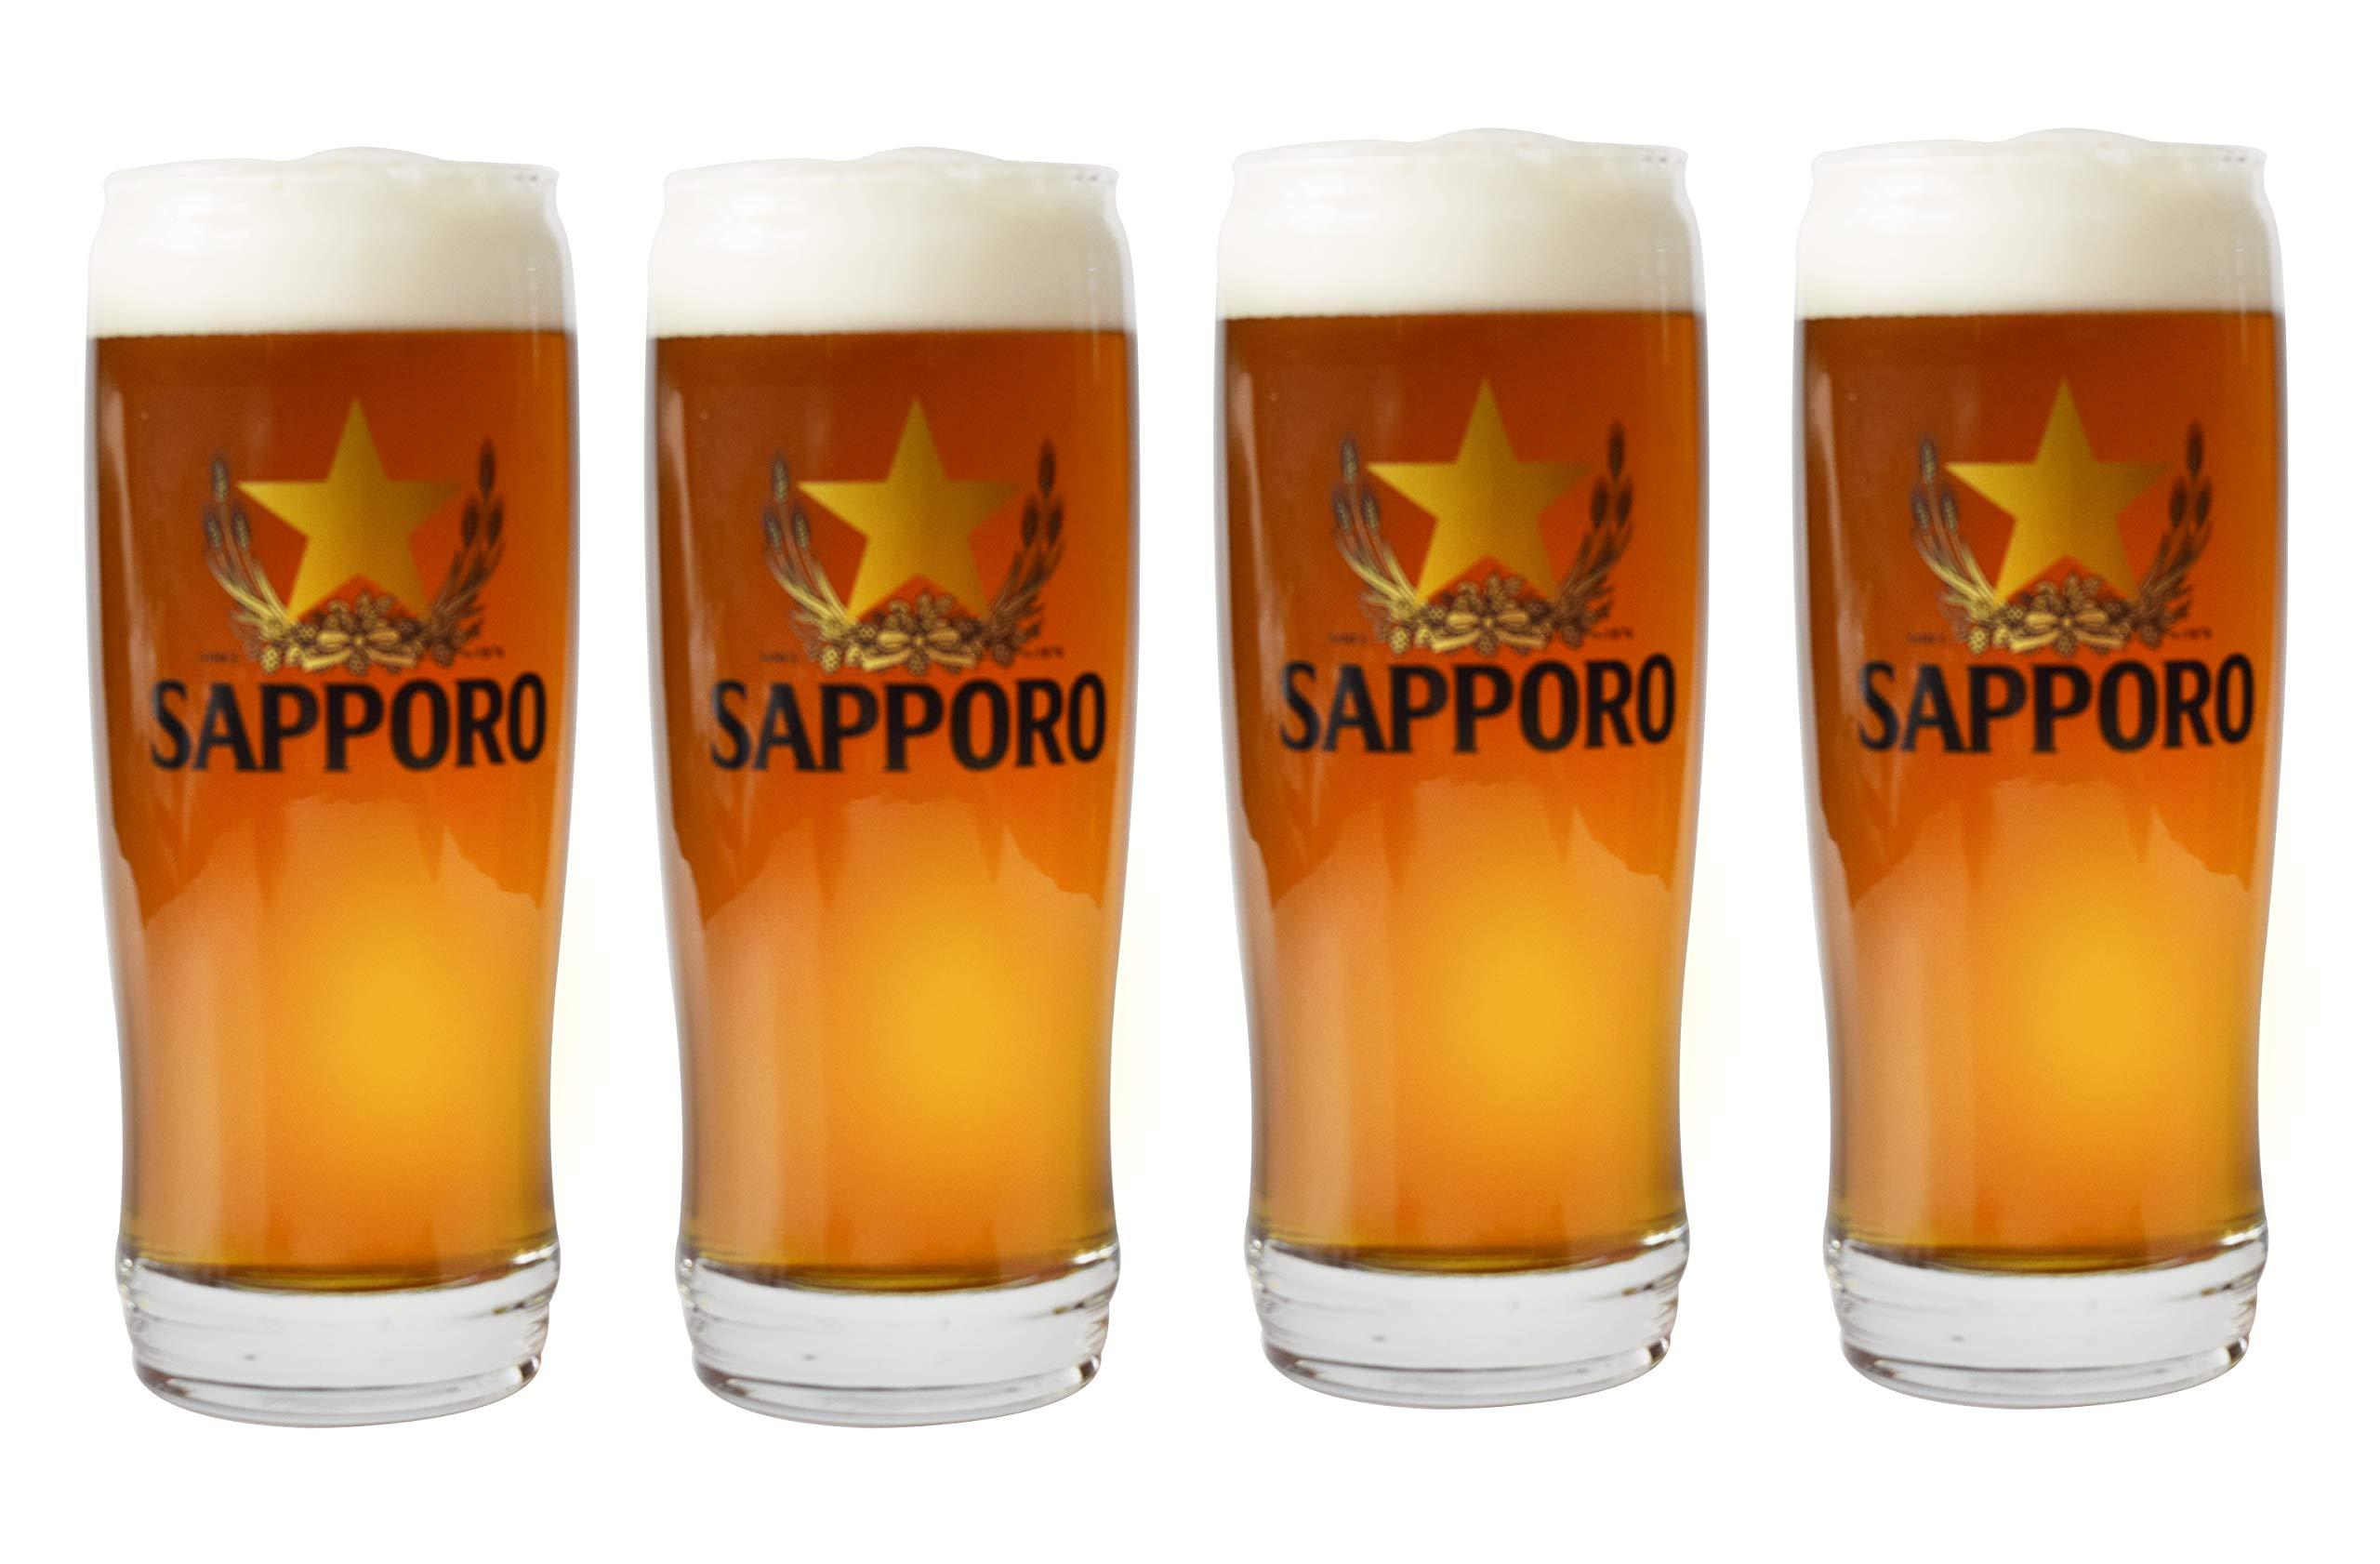 Sapporo Tumbler Beer Glass set of 4